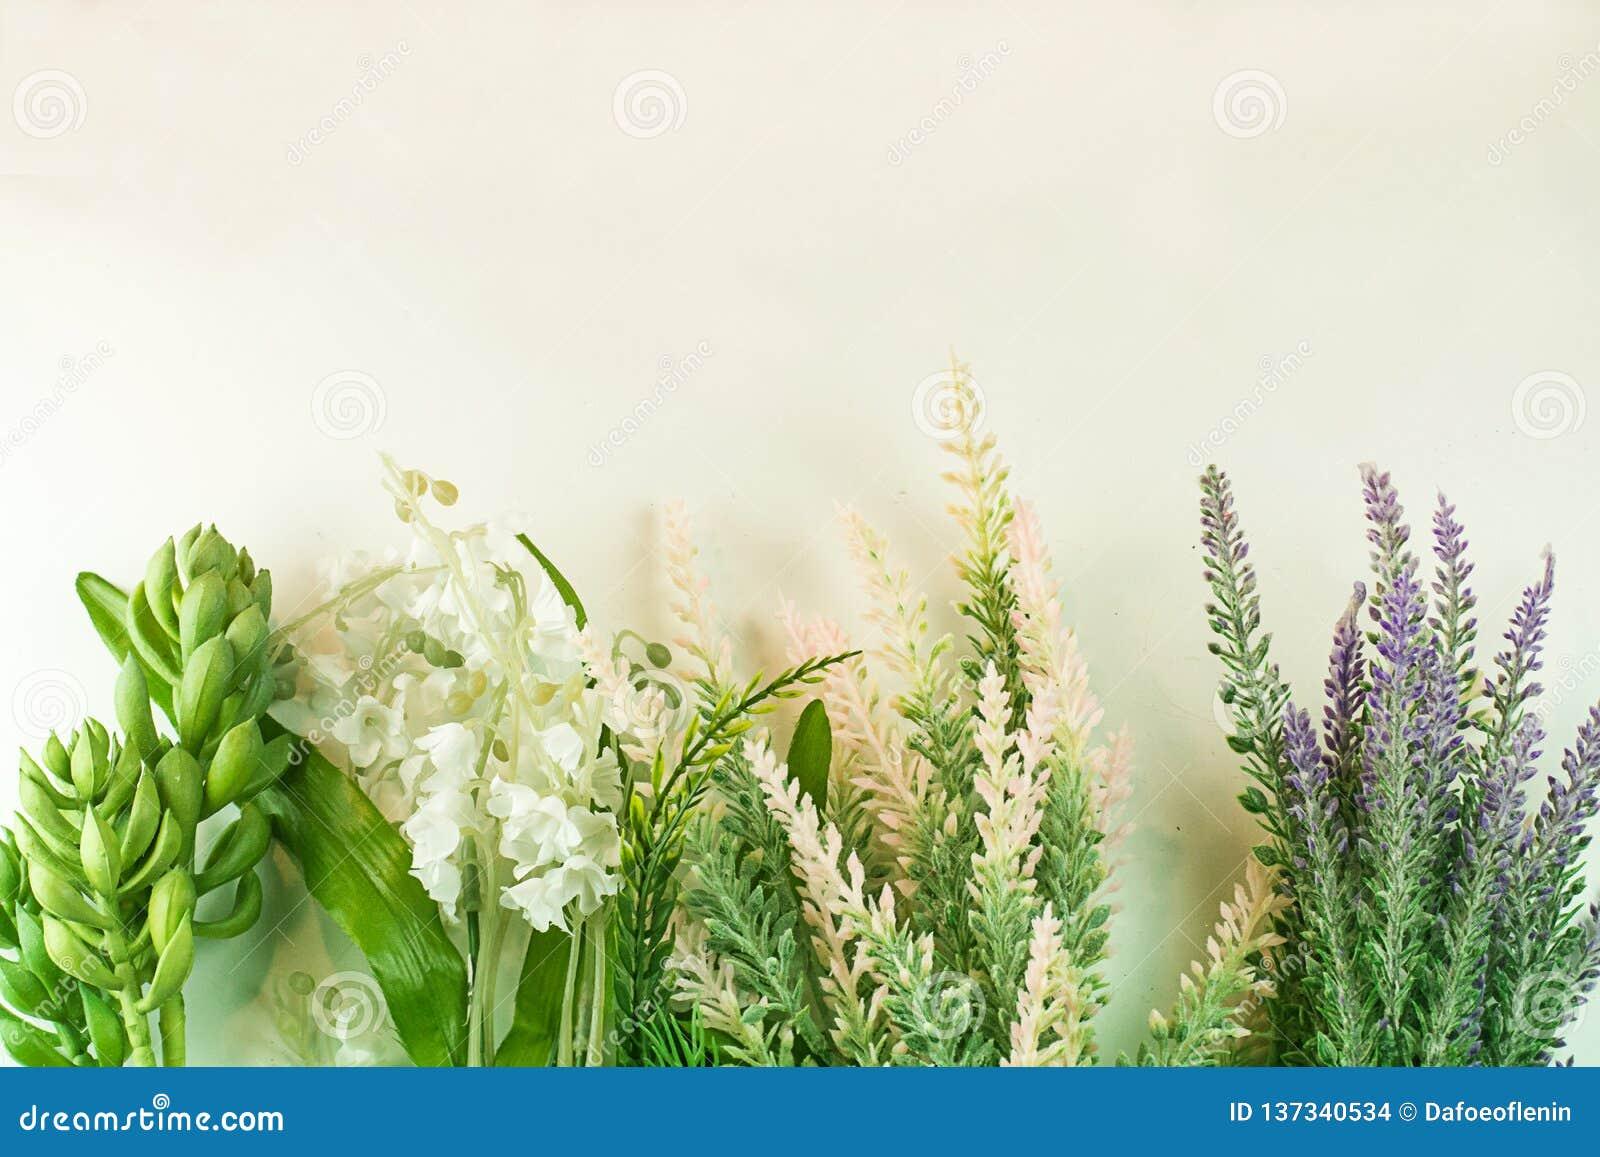 Plant Cluster Succulent Garden Fresh Nature Green Border Stock